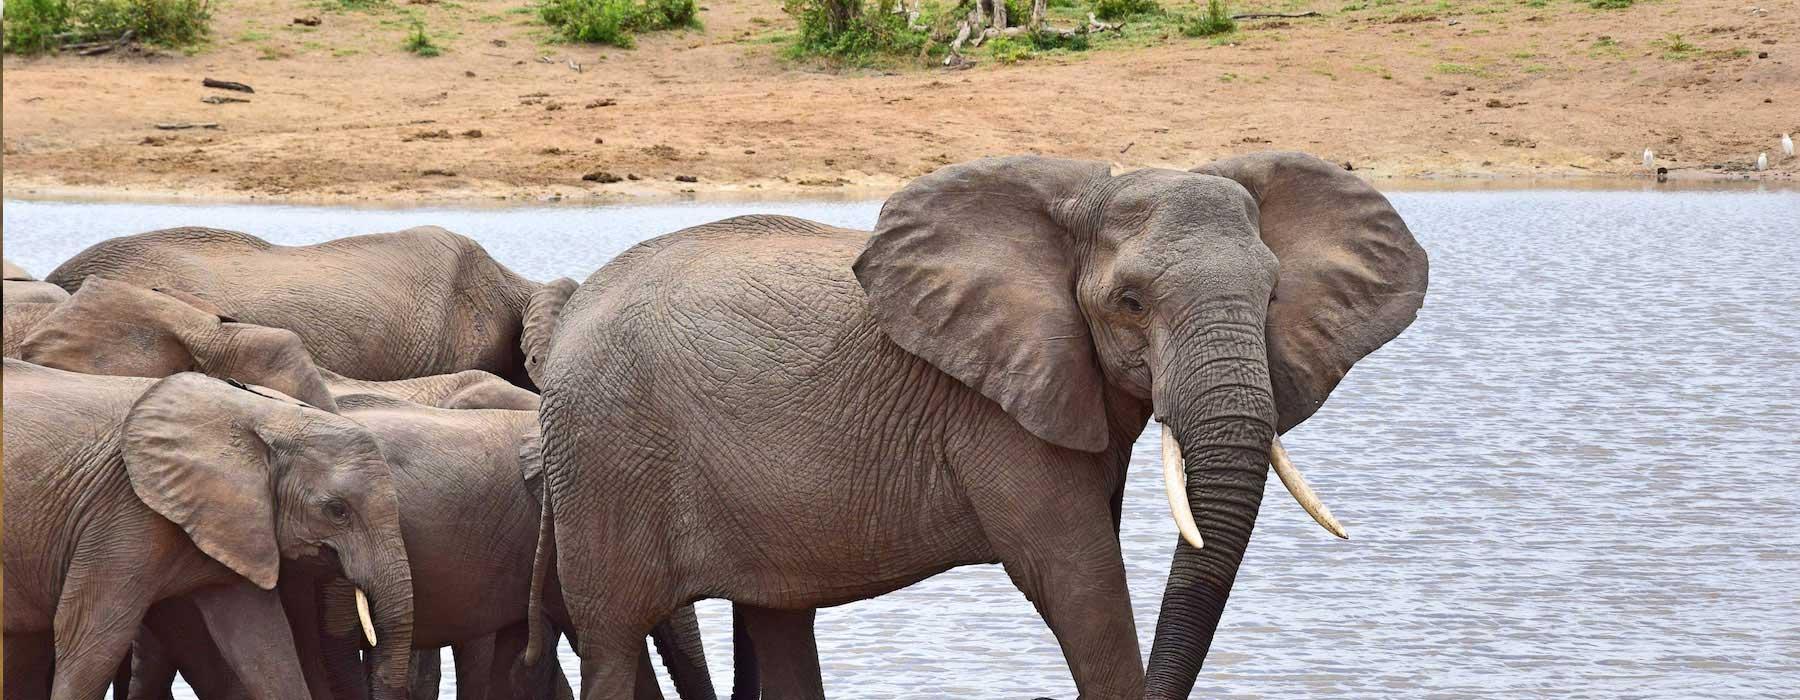 Tanzania Safaris Checklist